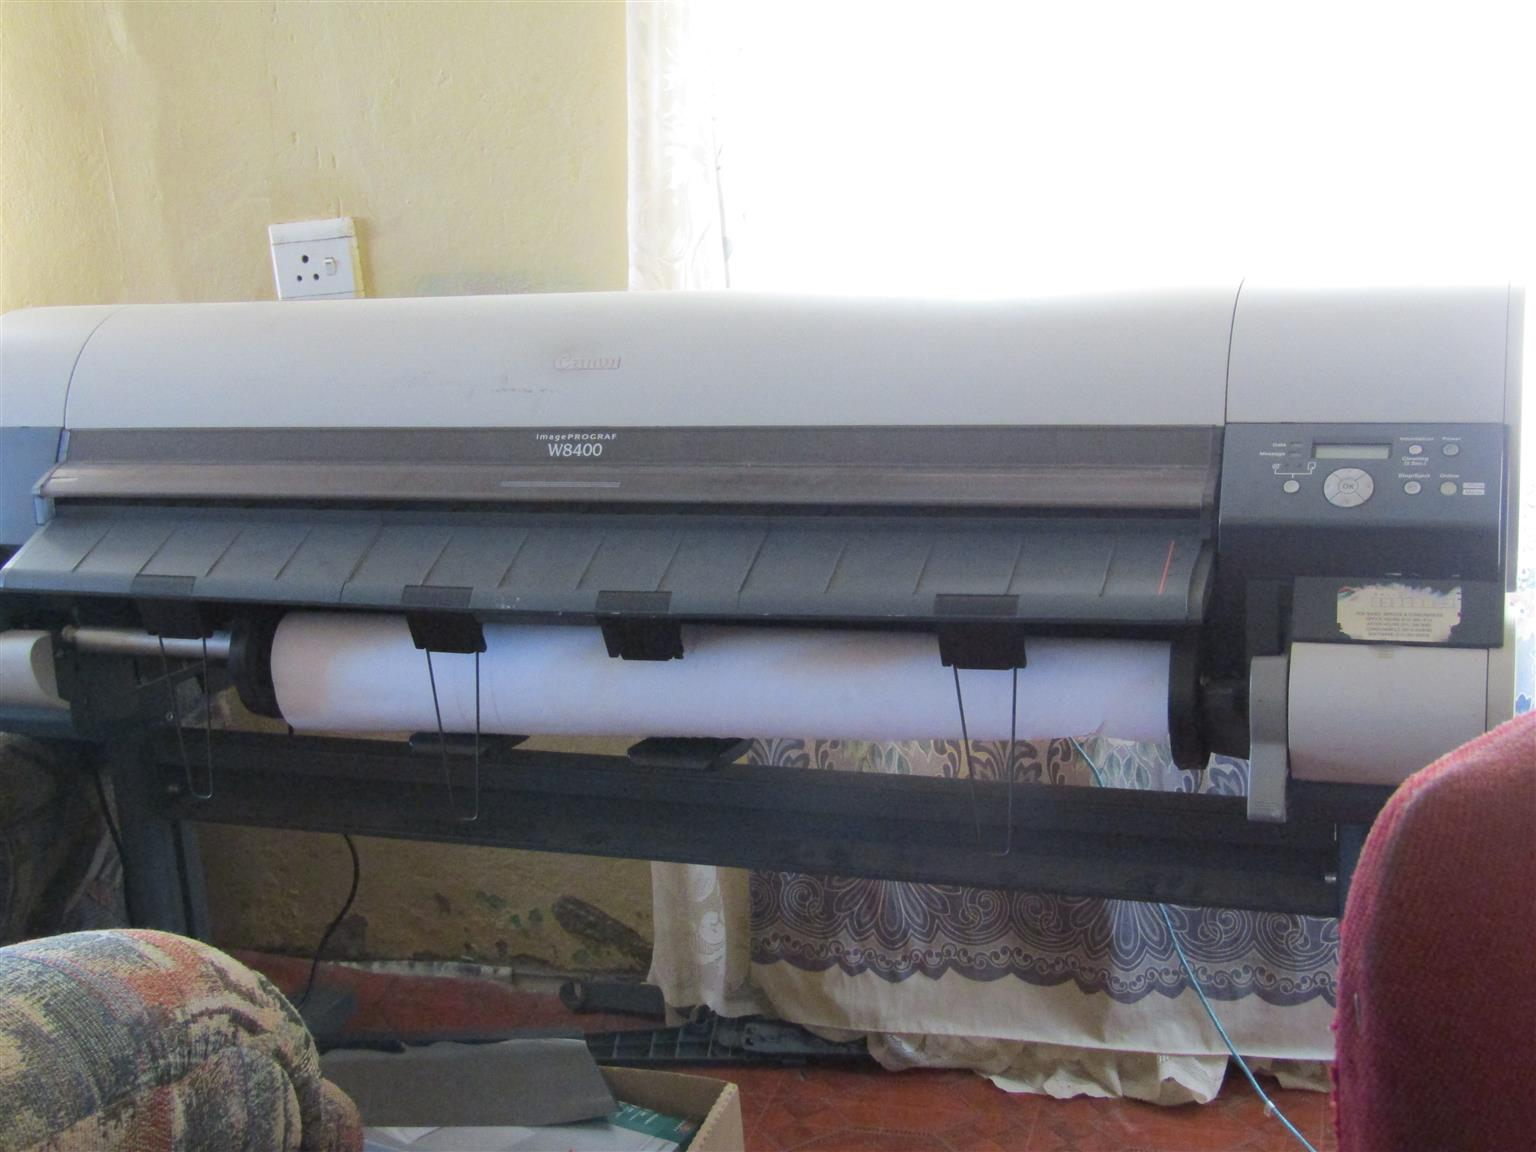 Printer, Large format Printer, Canon ImagePrograaf W8400